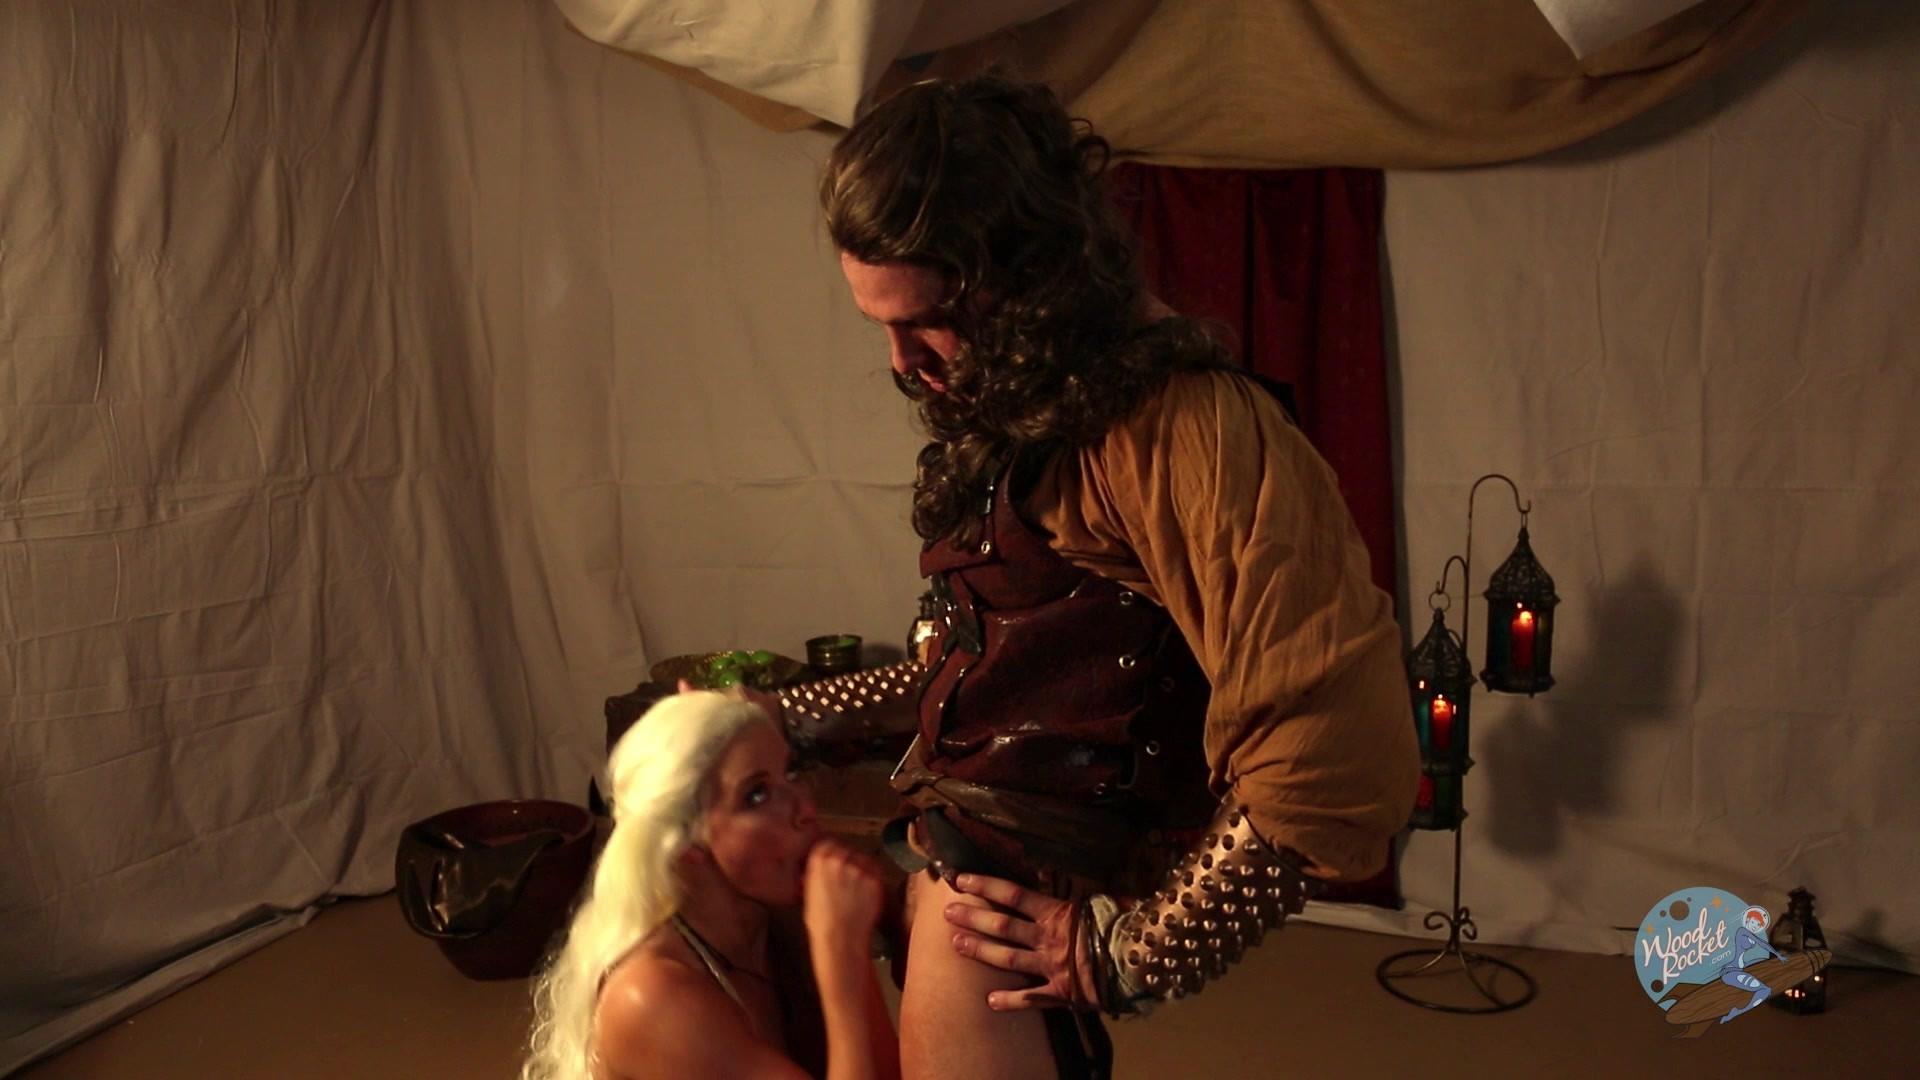 Slave auction fantasyporn sexy tubes